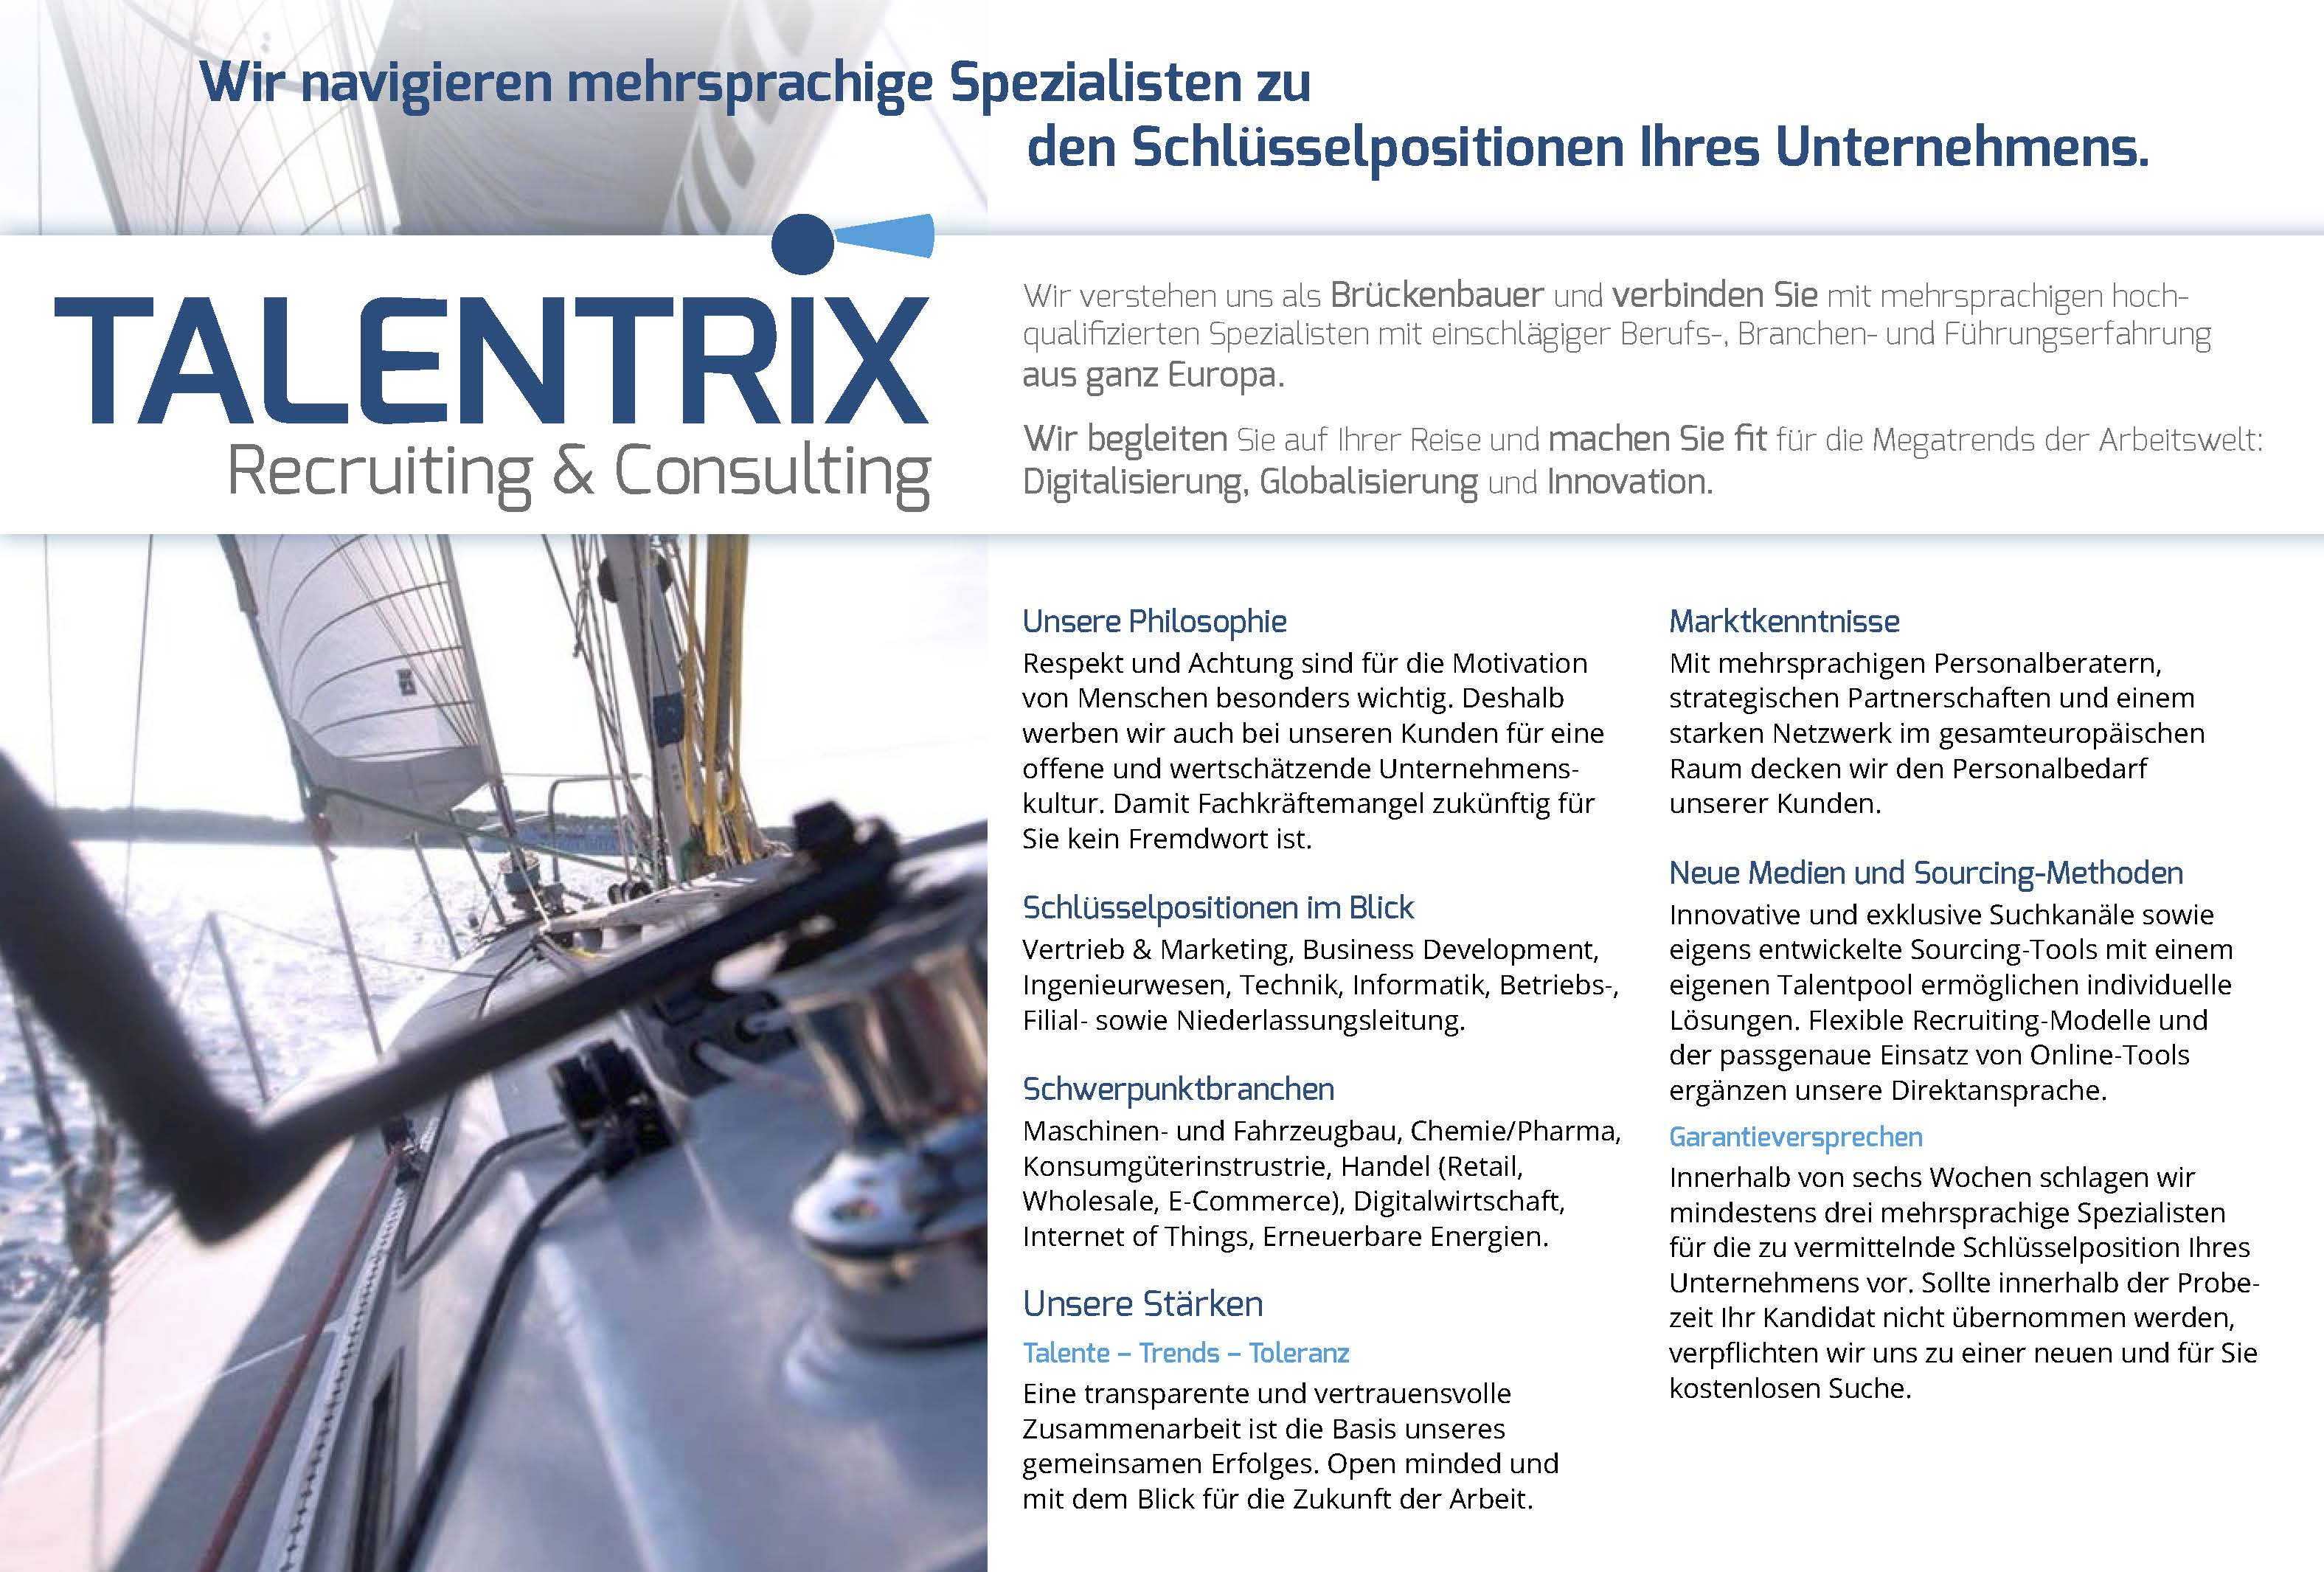 Talentrix – Recruiting & Consulting - Sonja Maksic